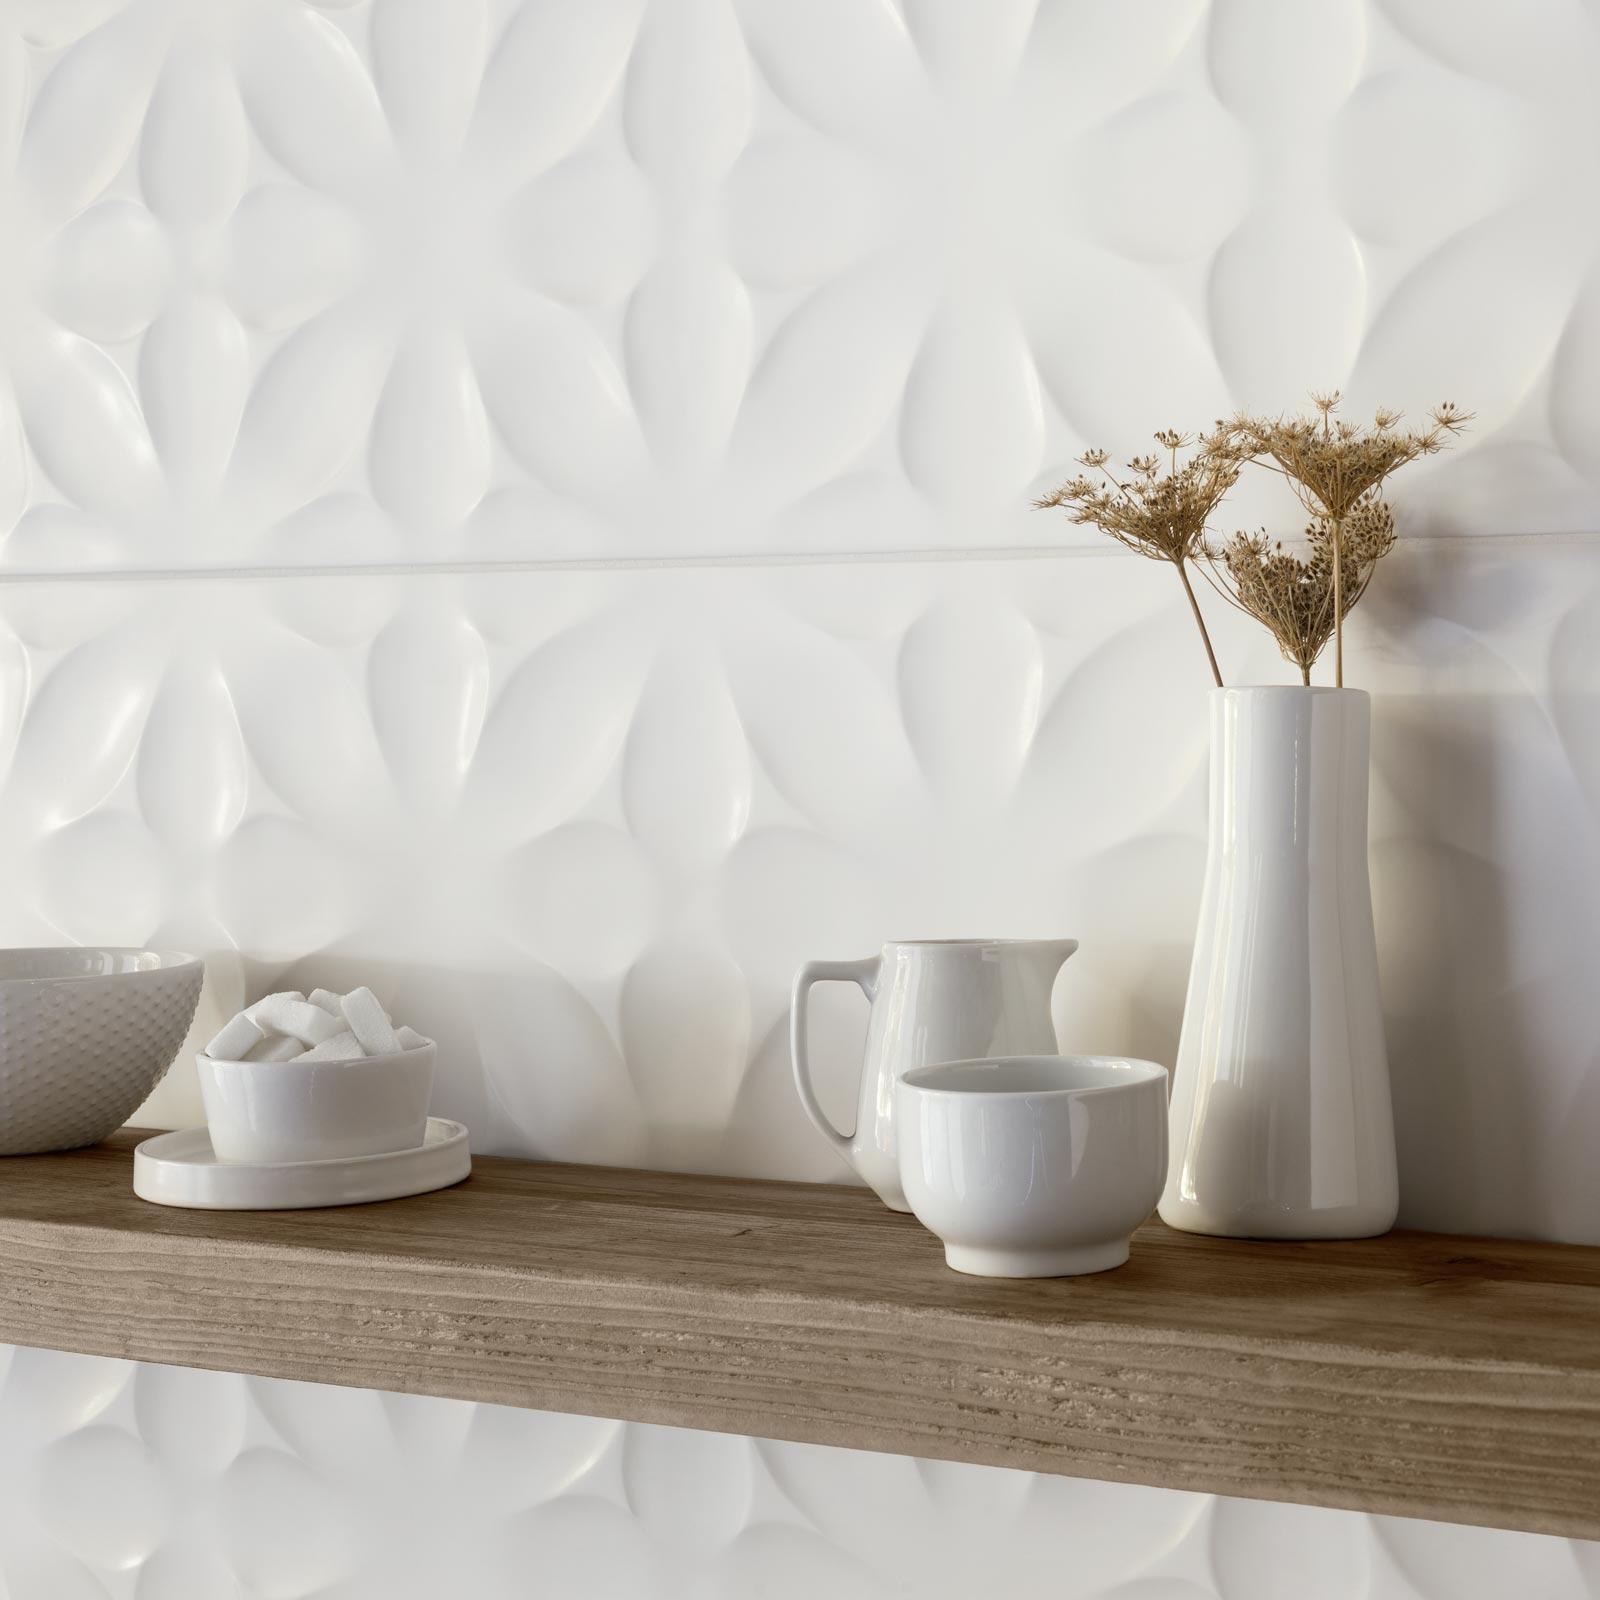 Stunning Piastrelle Ragno Cucina Pictures - Home Interior Ideas ...